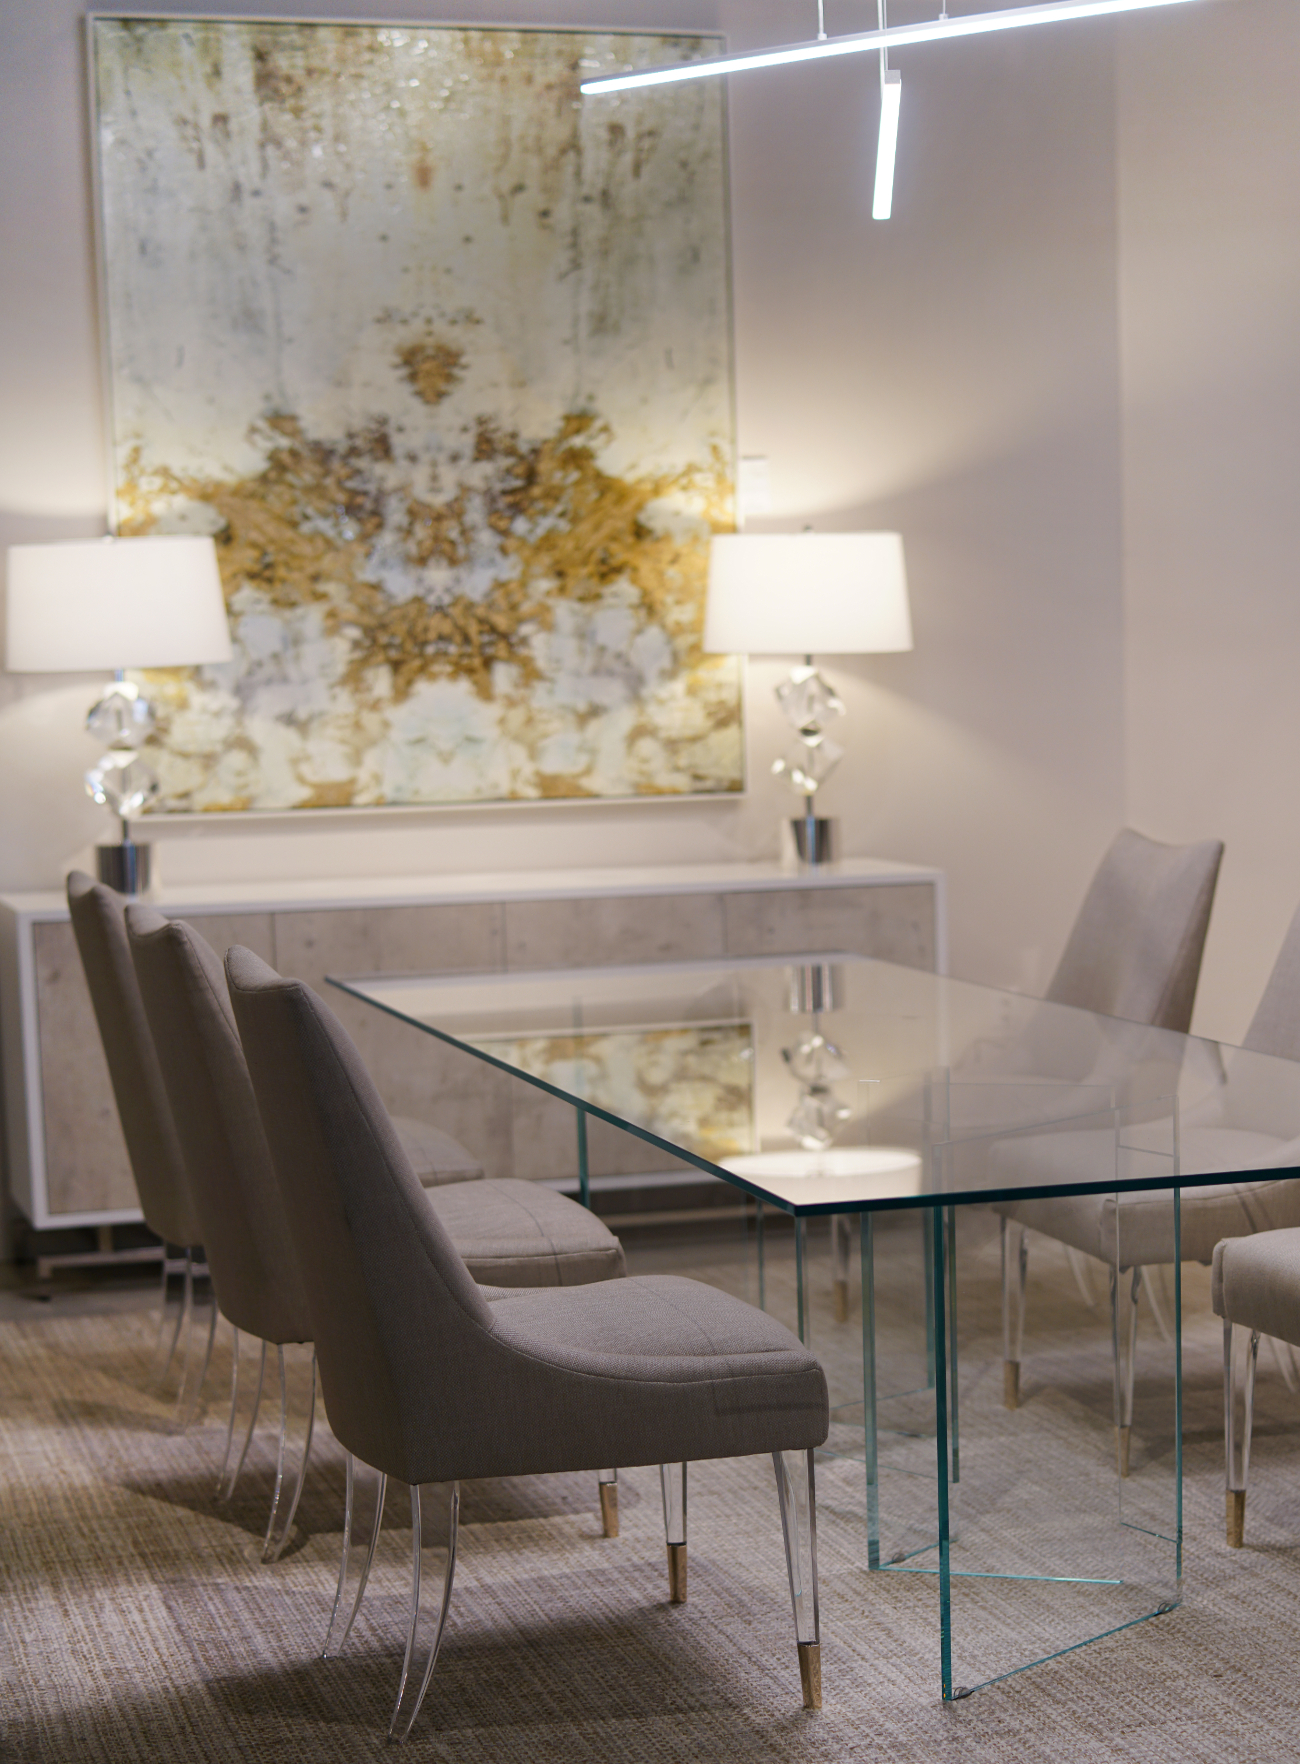 dolce-vita-design-interior-designer-miami-fl-florida-coral-gables-3-rs6